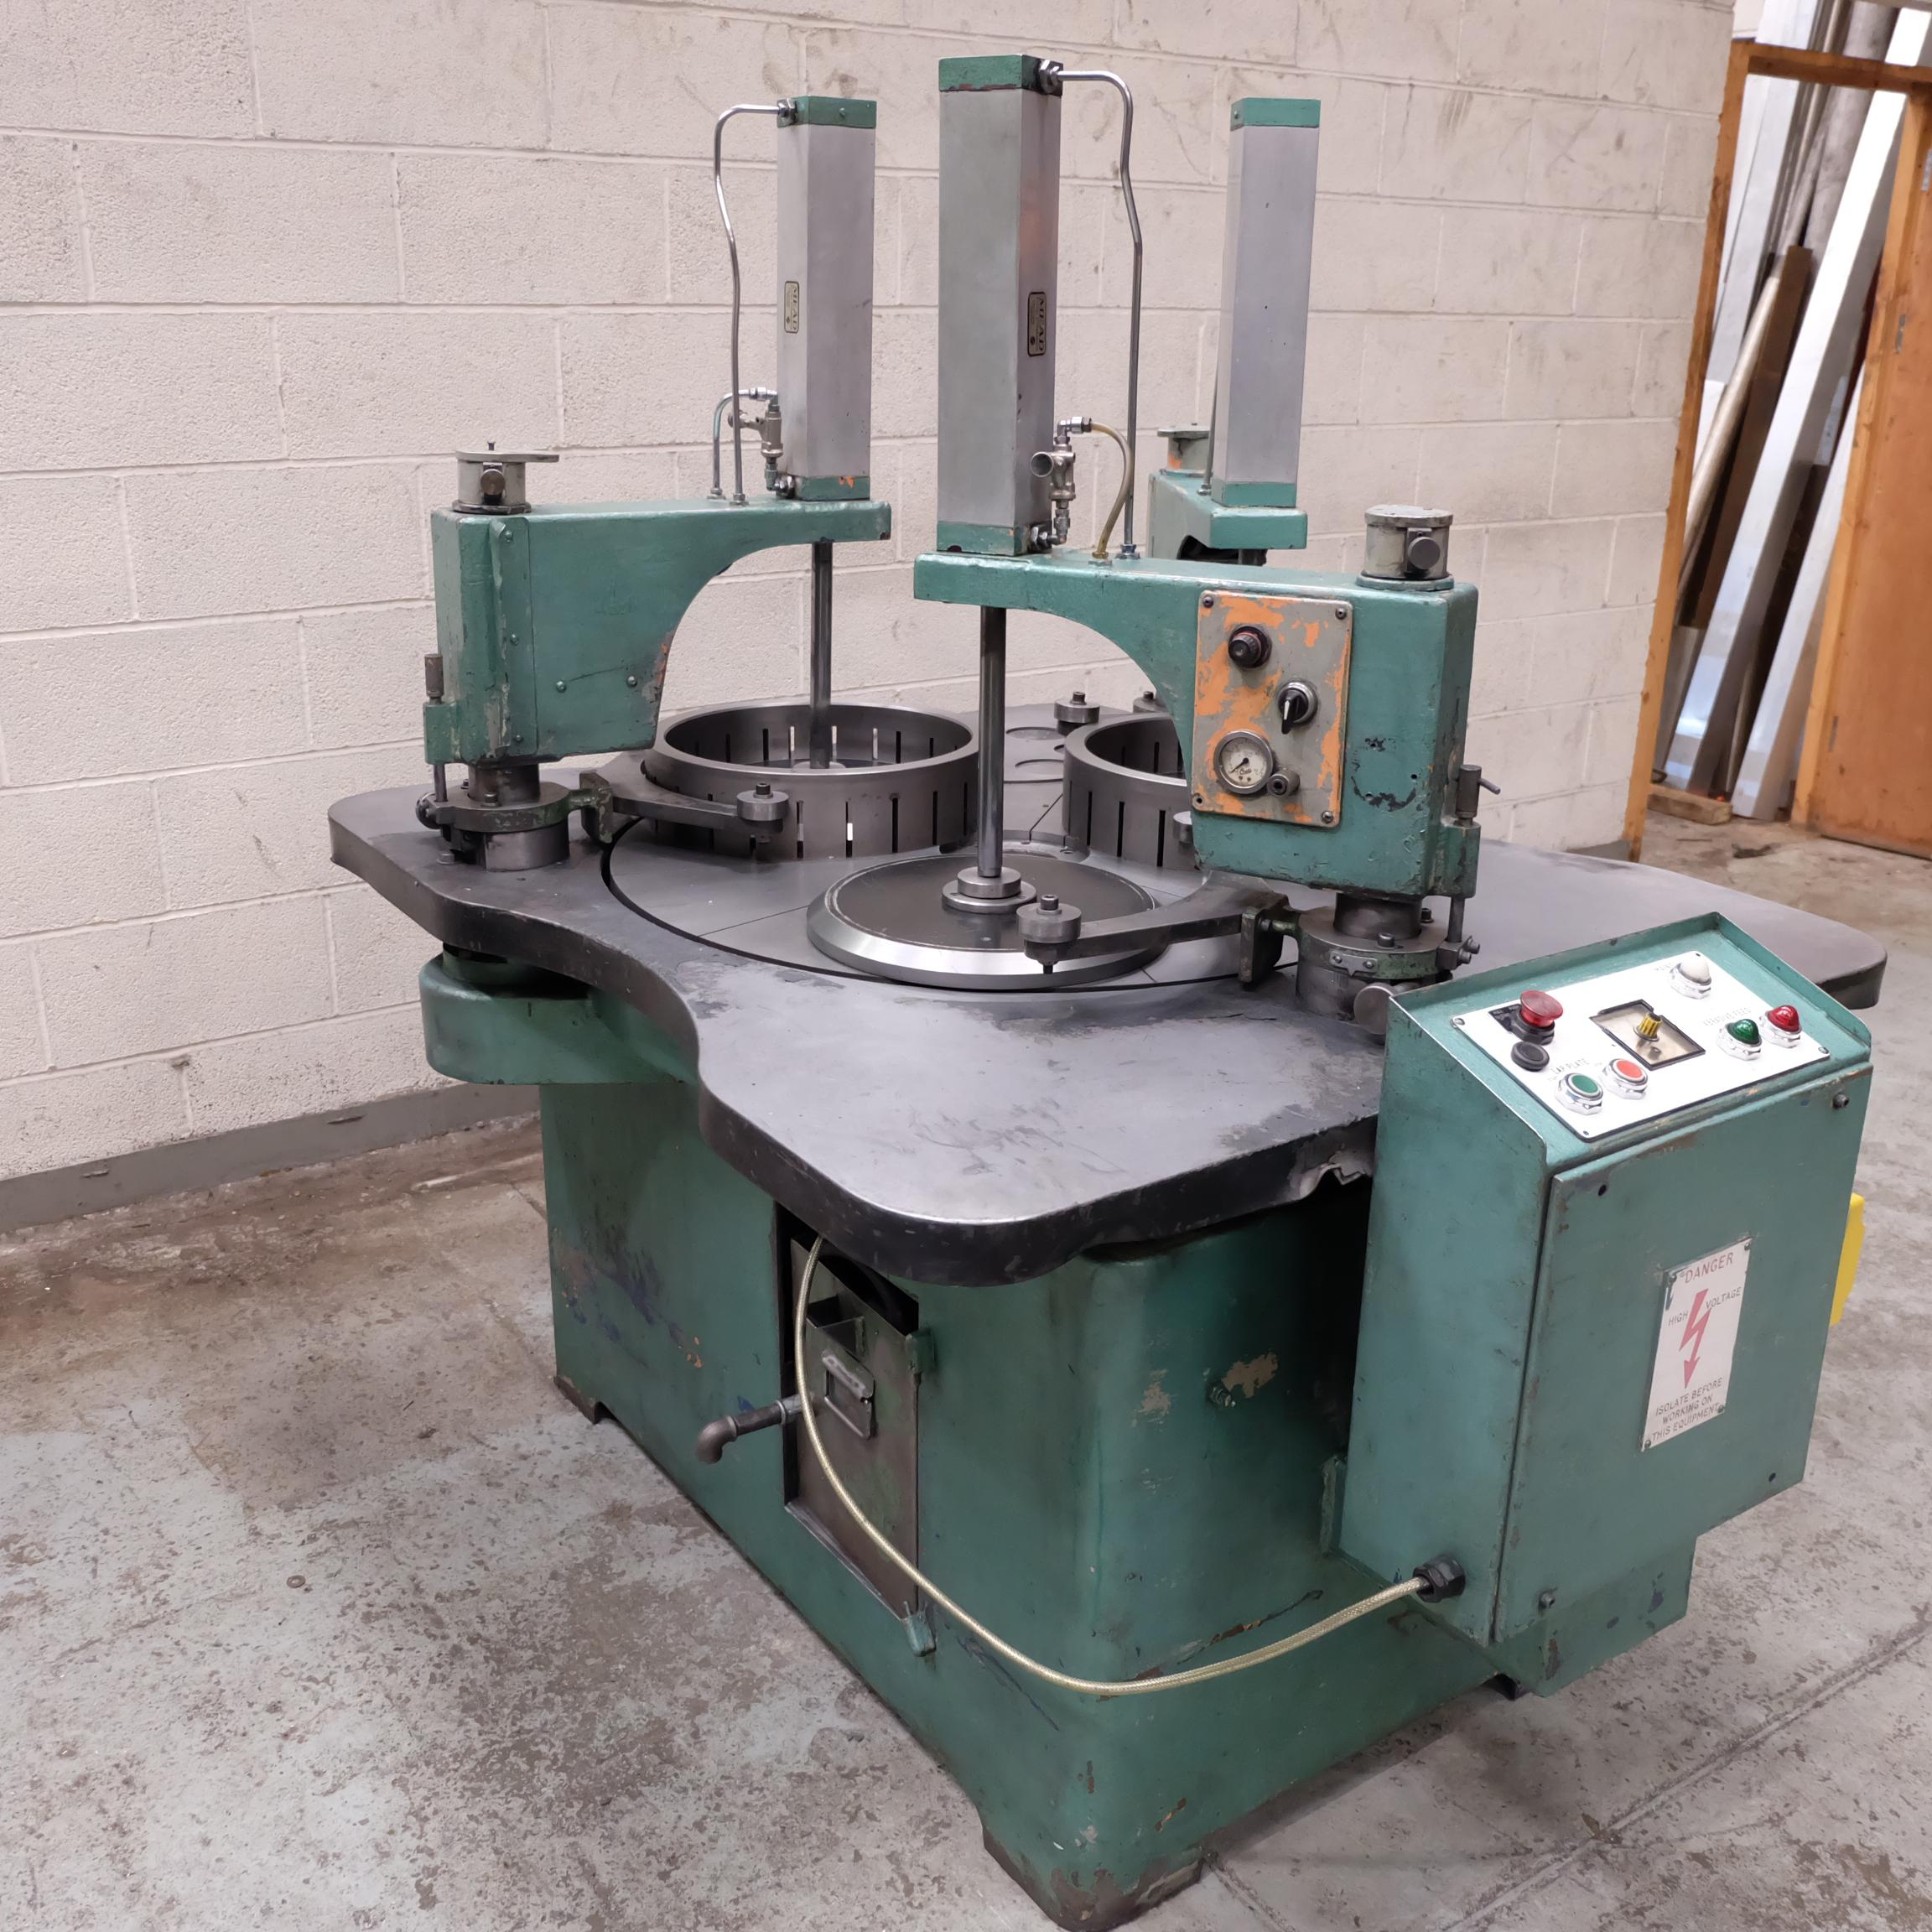 Lot 44 - A Precisionlap Model 36 Lapping Machine, Table dia